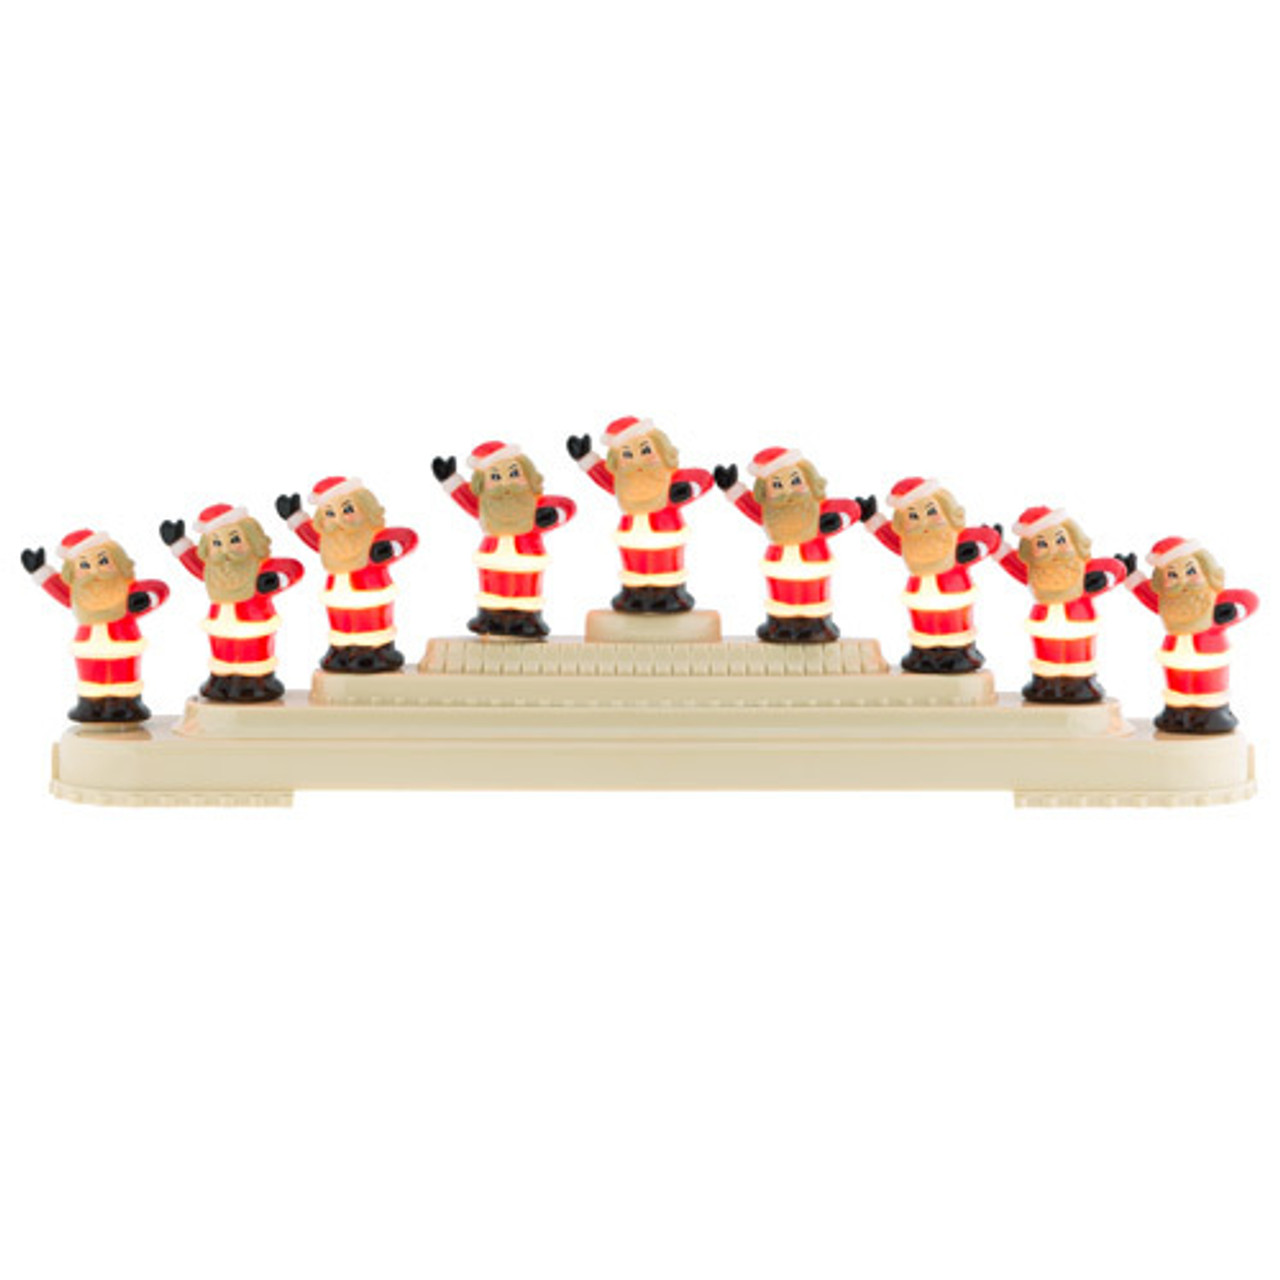 Christopher Radko Shiny Brite Holiday Splendor Santa Bubble Light Candolier Christopher Radko Shiny Brite Shiny Brite Candolier Santa Light Vintage Inspired Christmas Decor